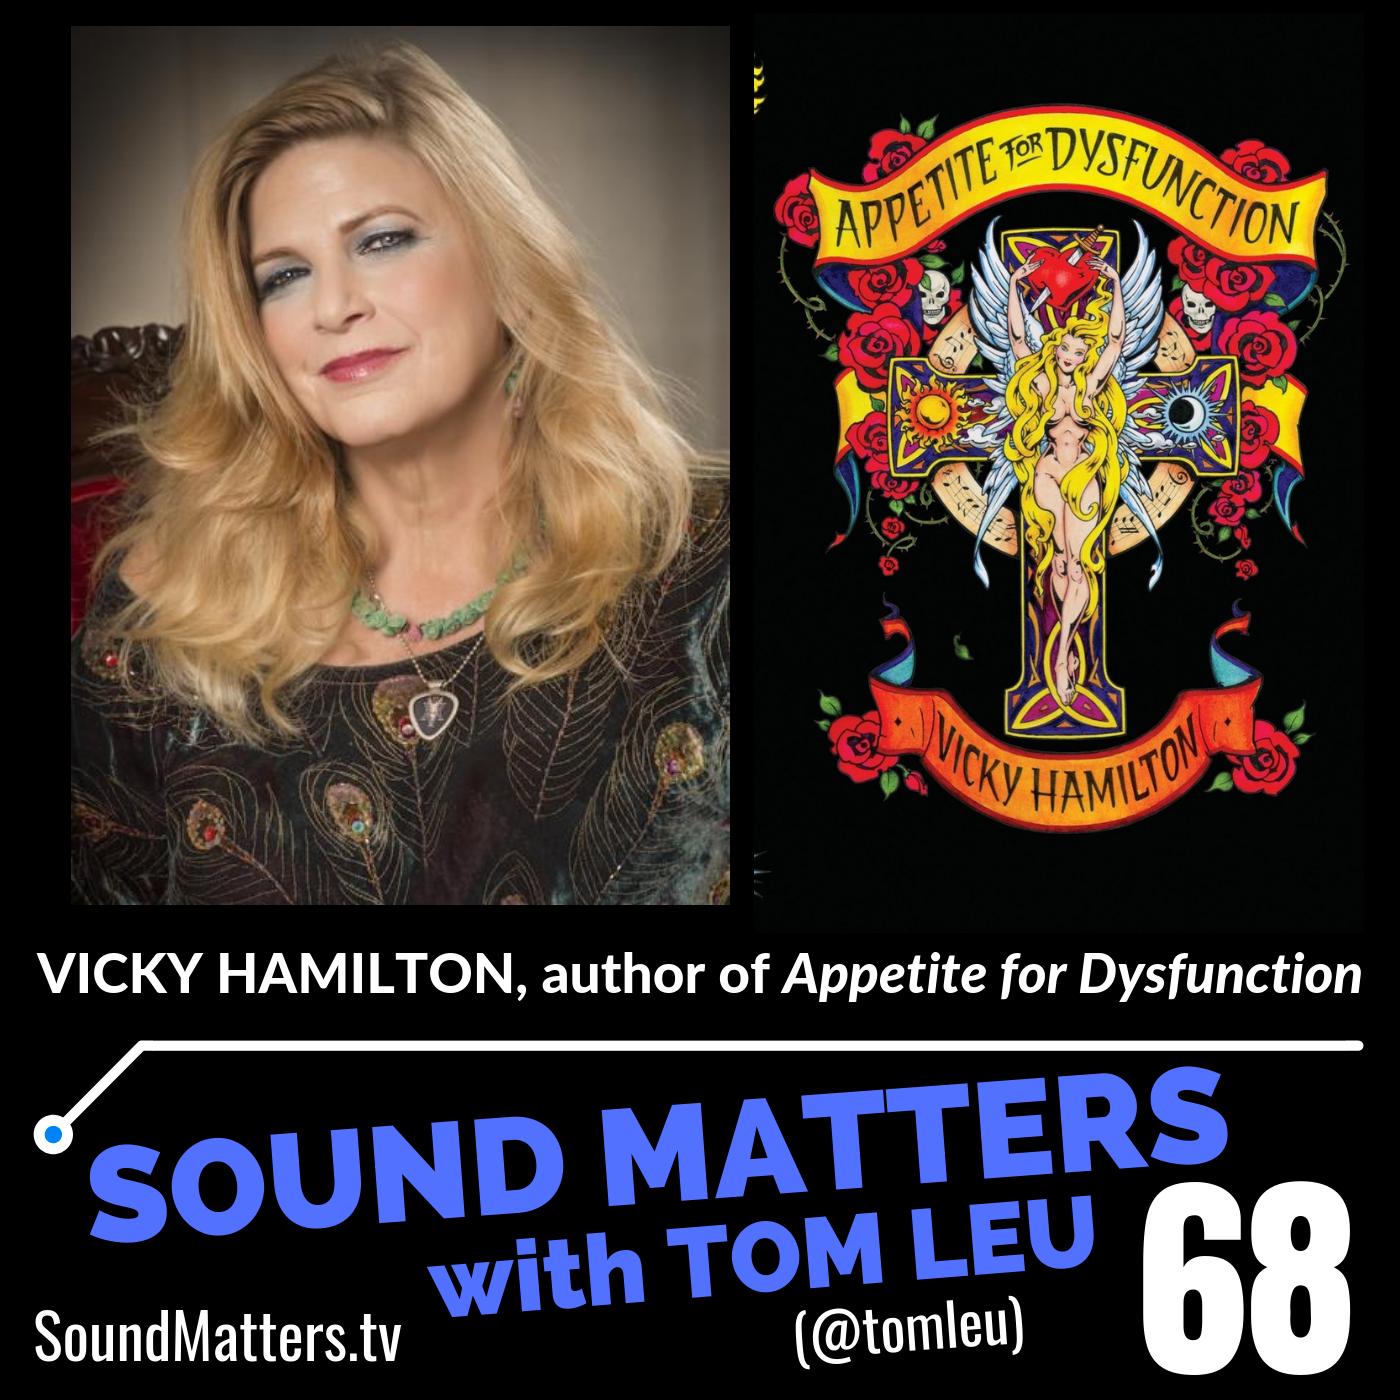 interview – SOUND MATTERS with Tom Leu